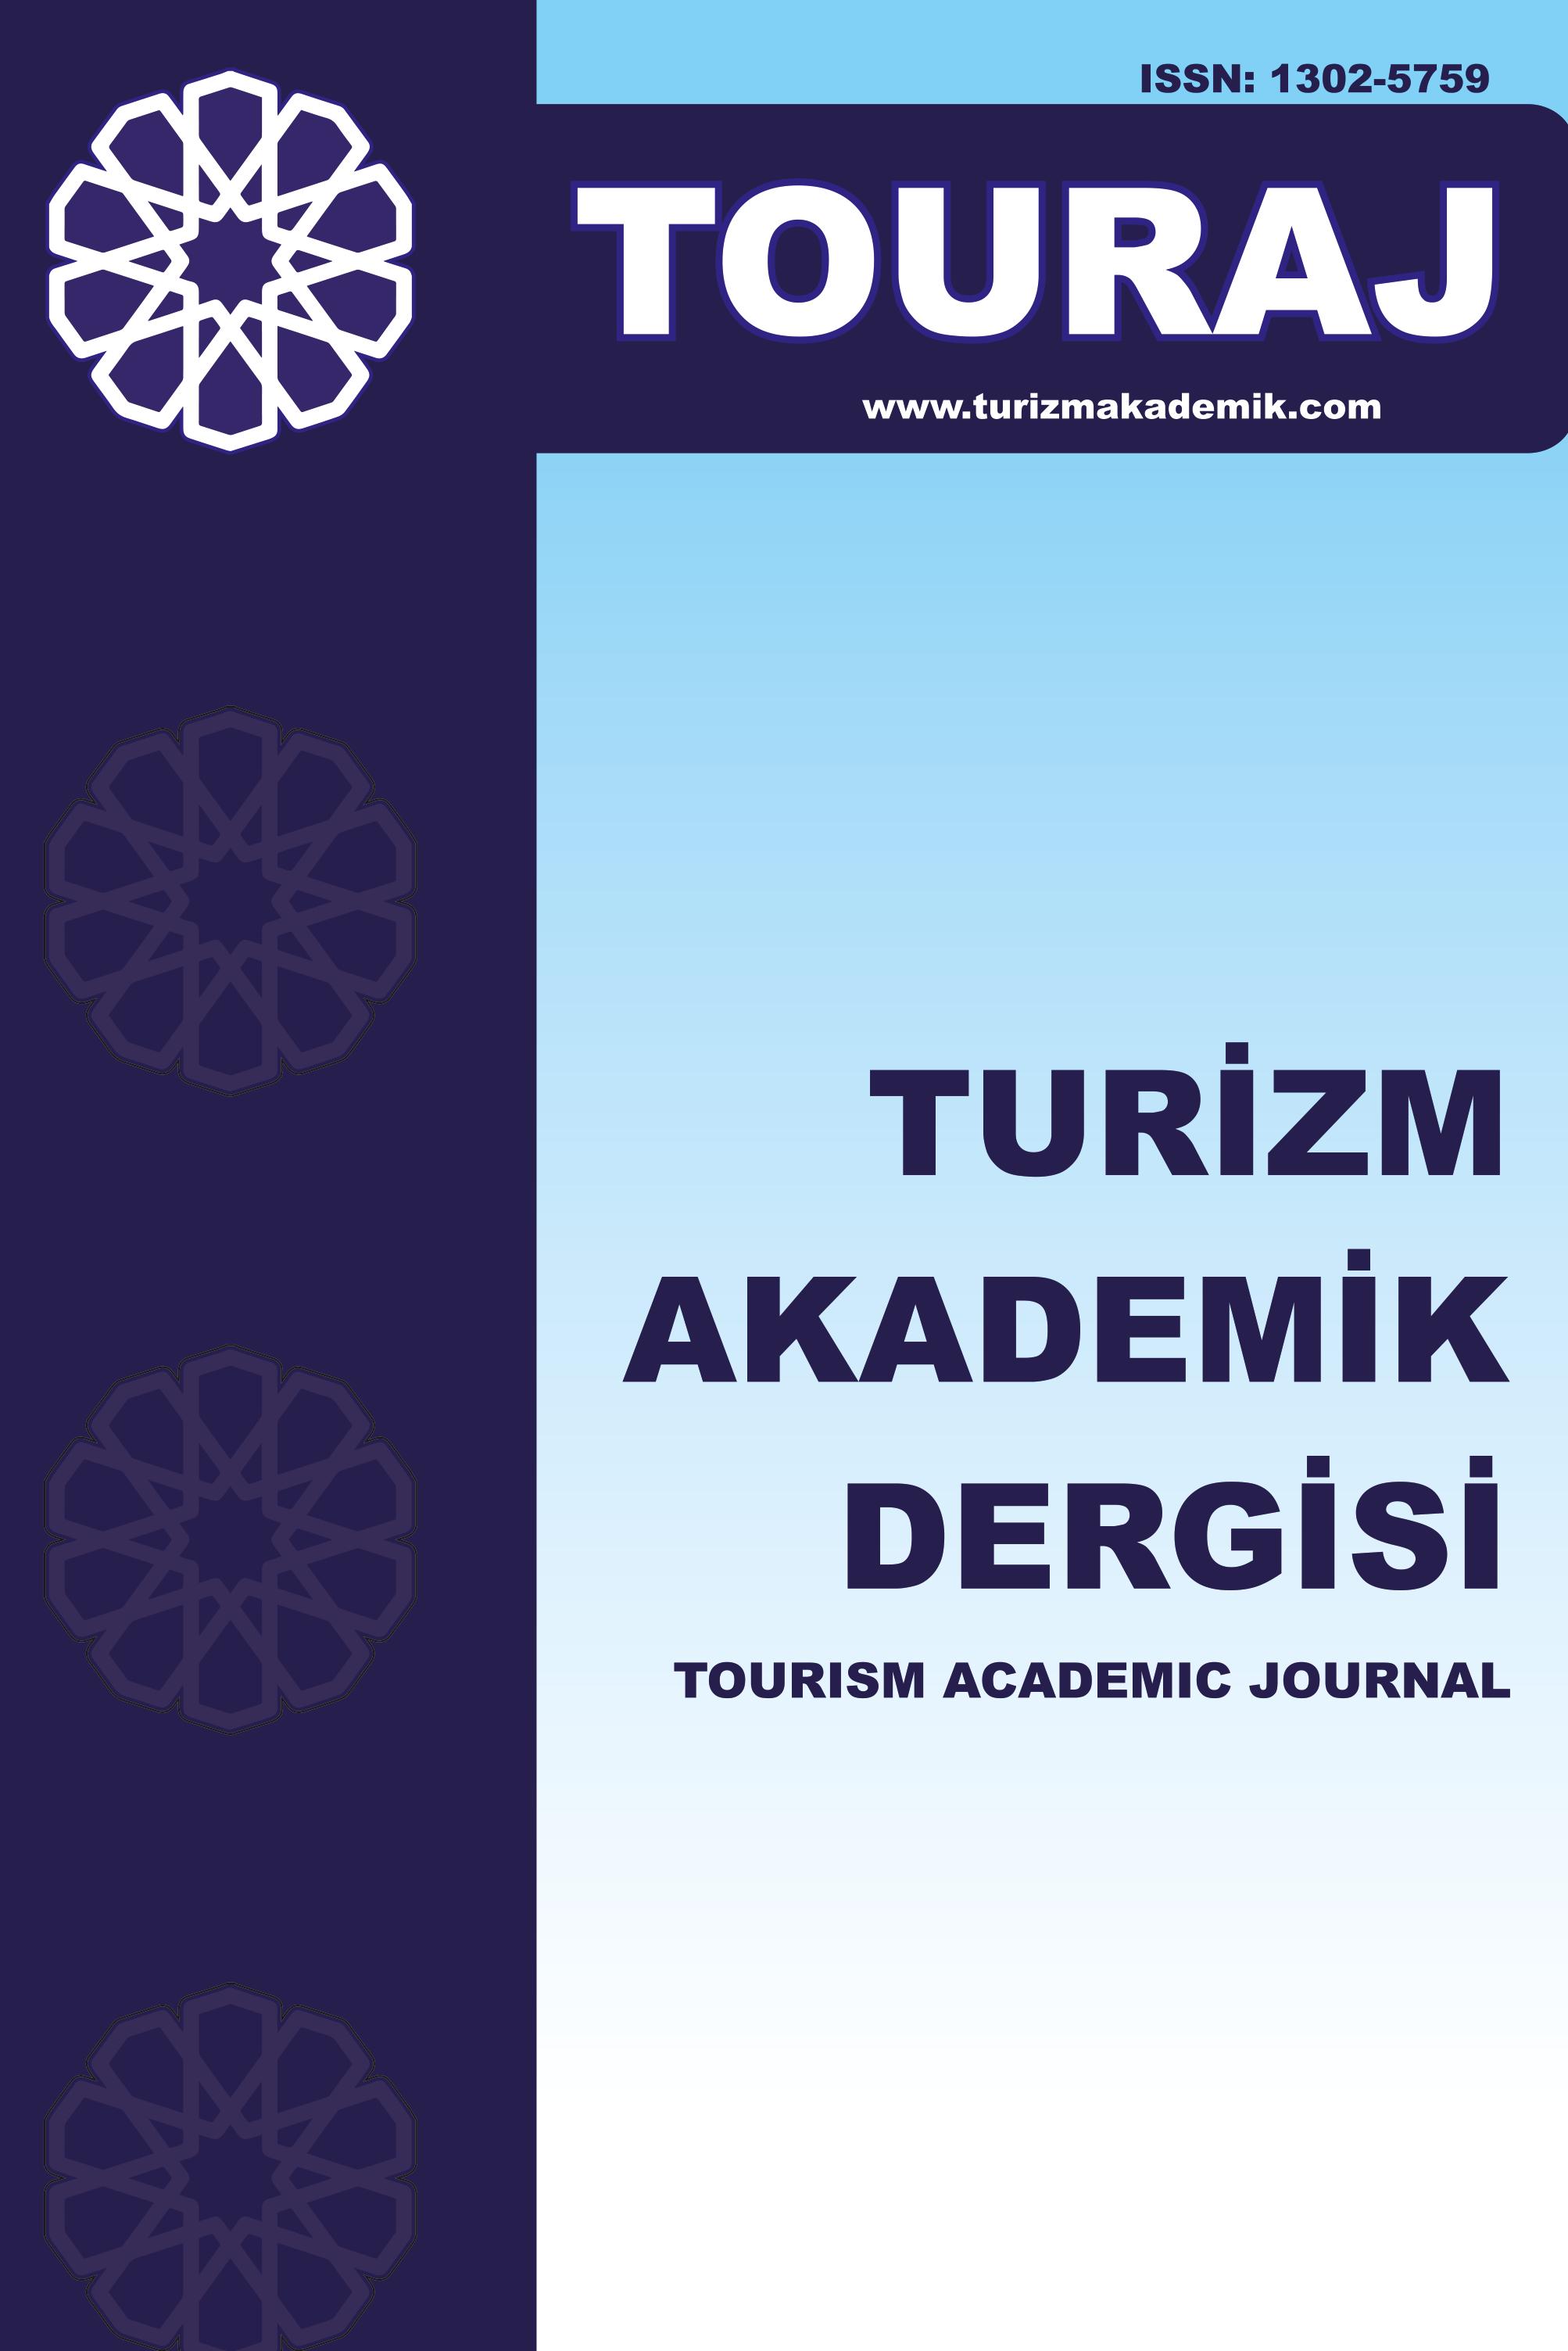 Turizm Akademik Dergisi